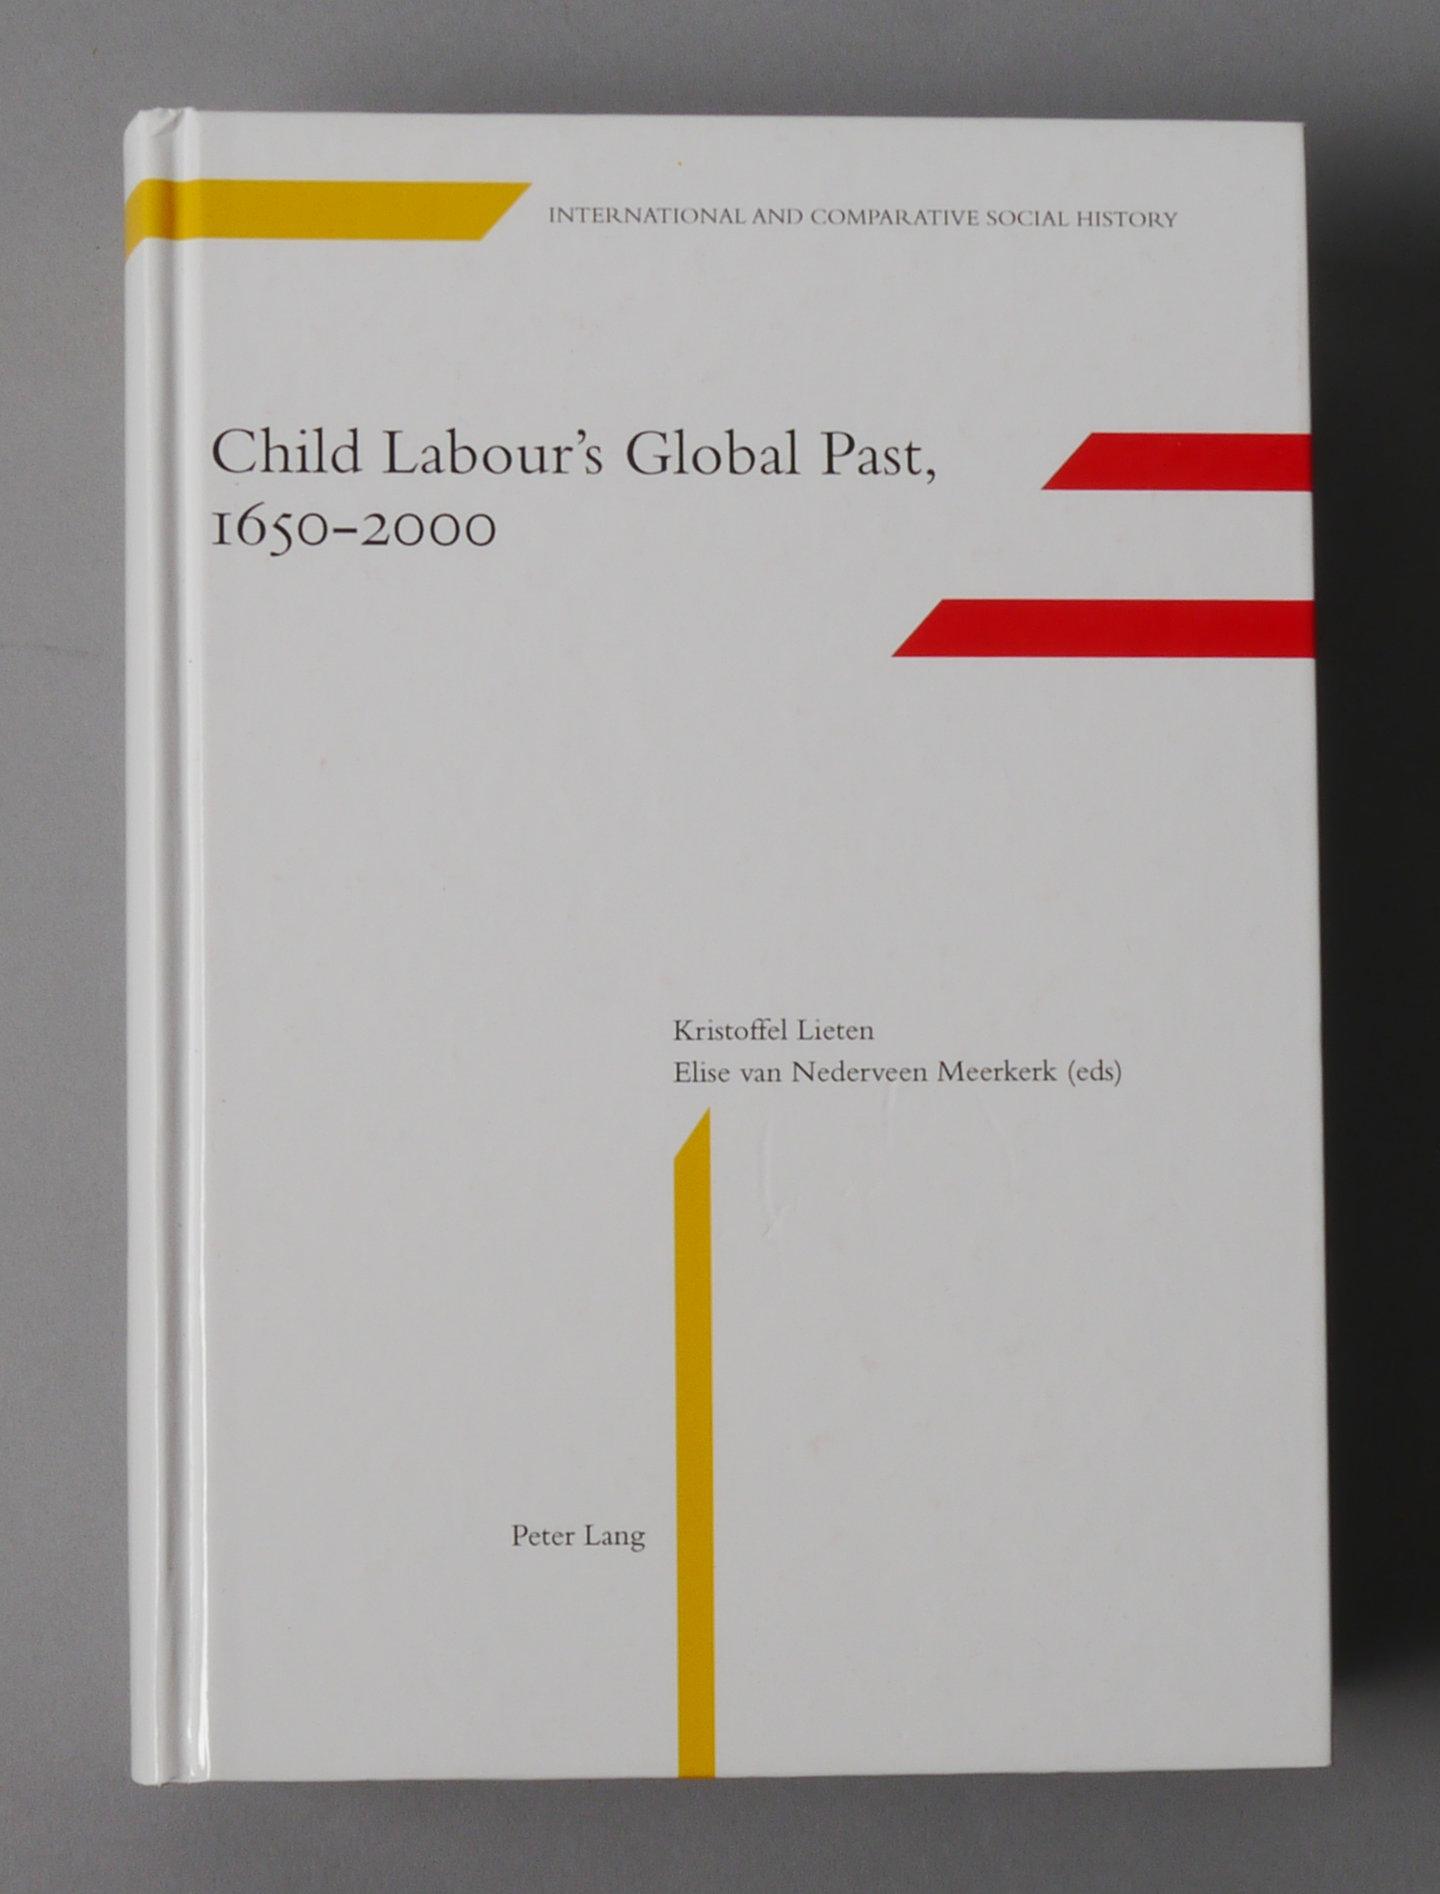 Child Labour's Global Past 1650-2000.